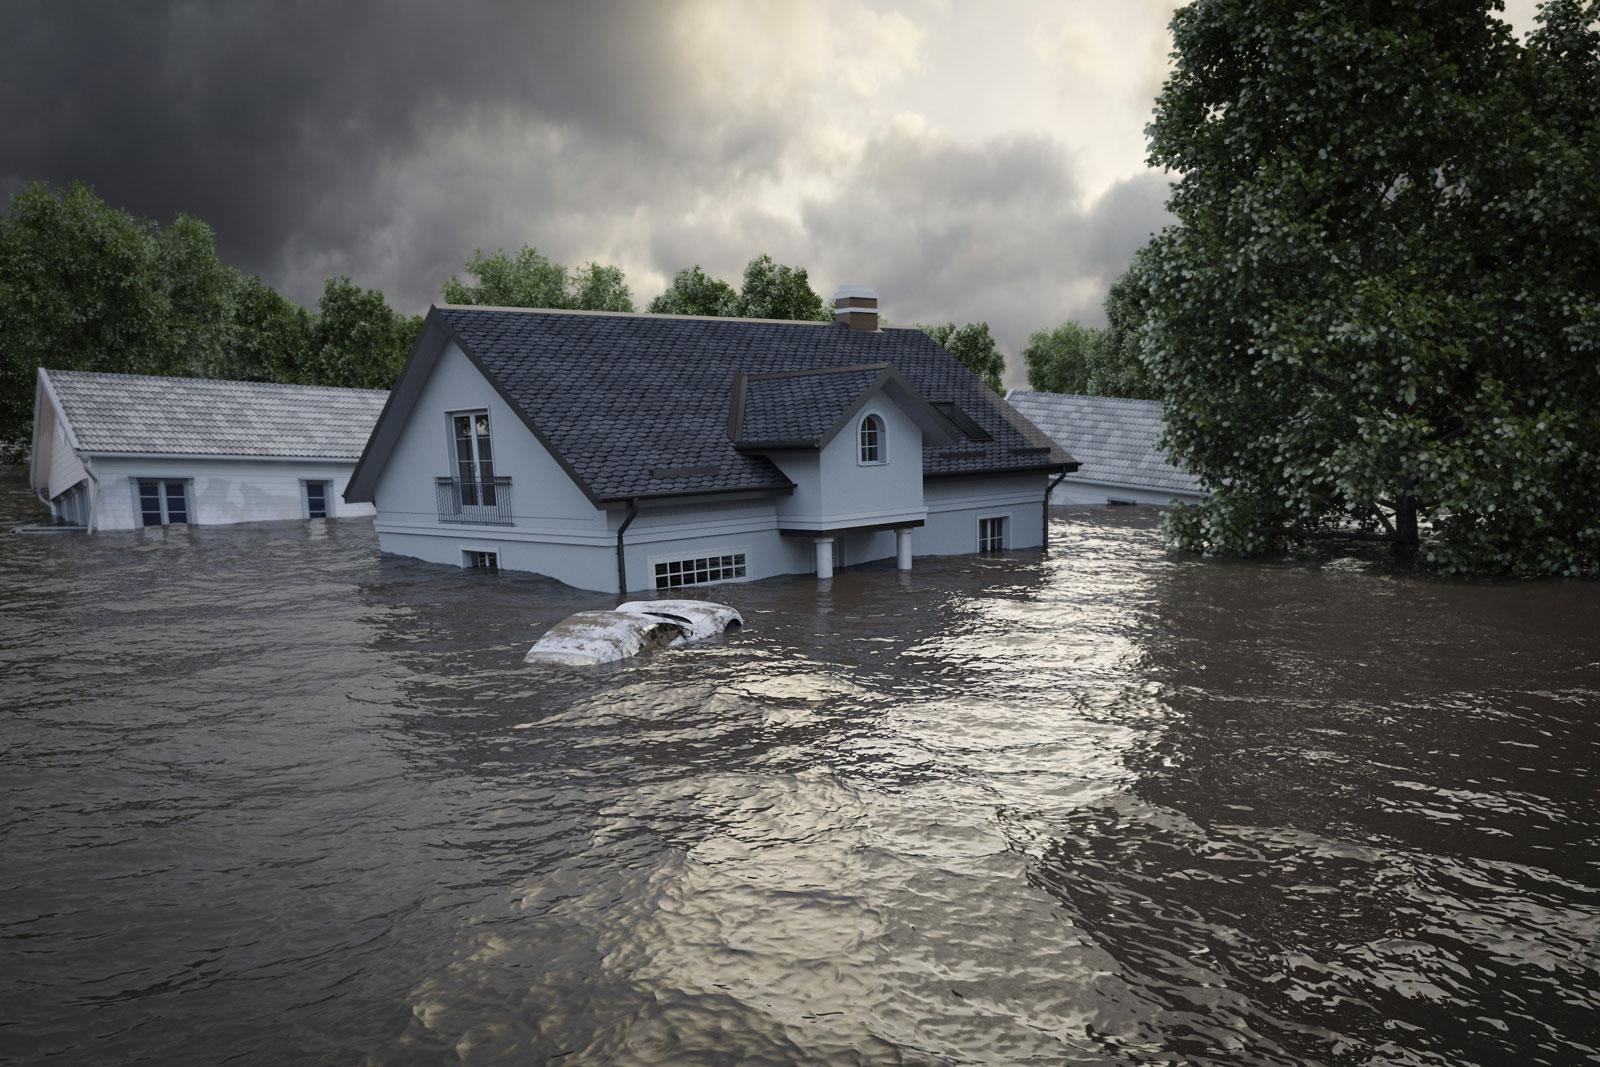 FLOOD AND RAIN STORM REPAIR LEADS